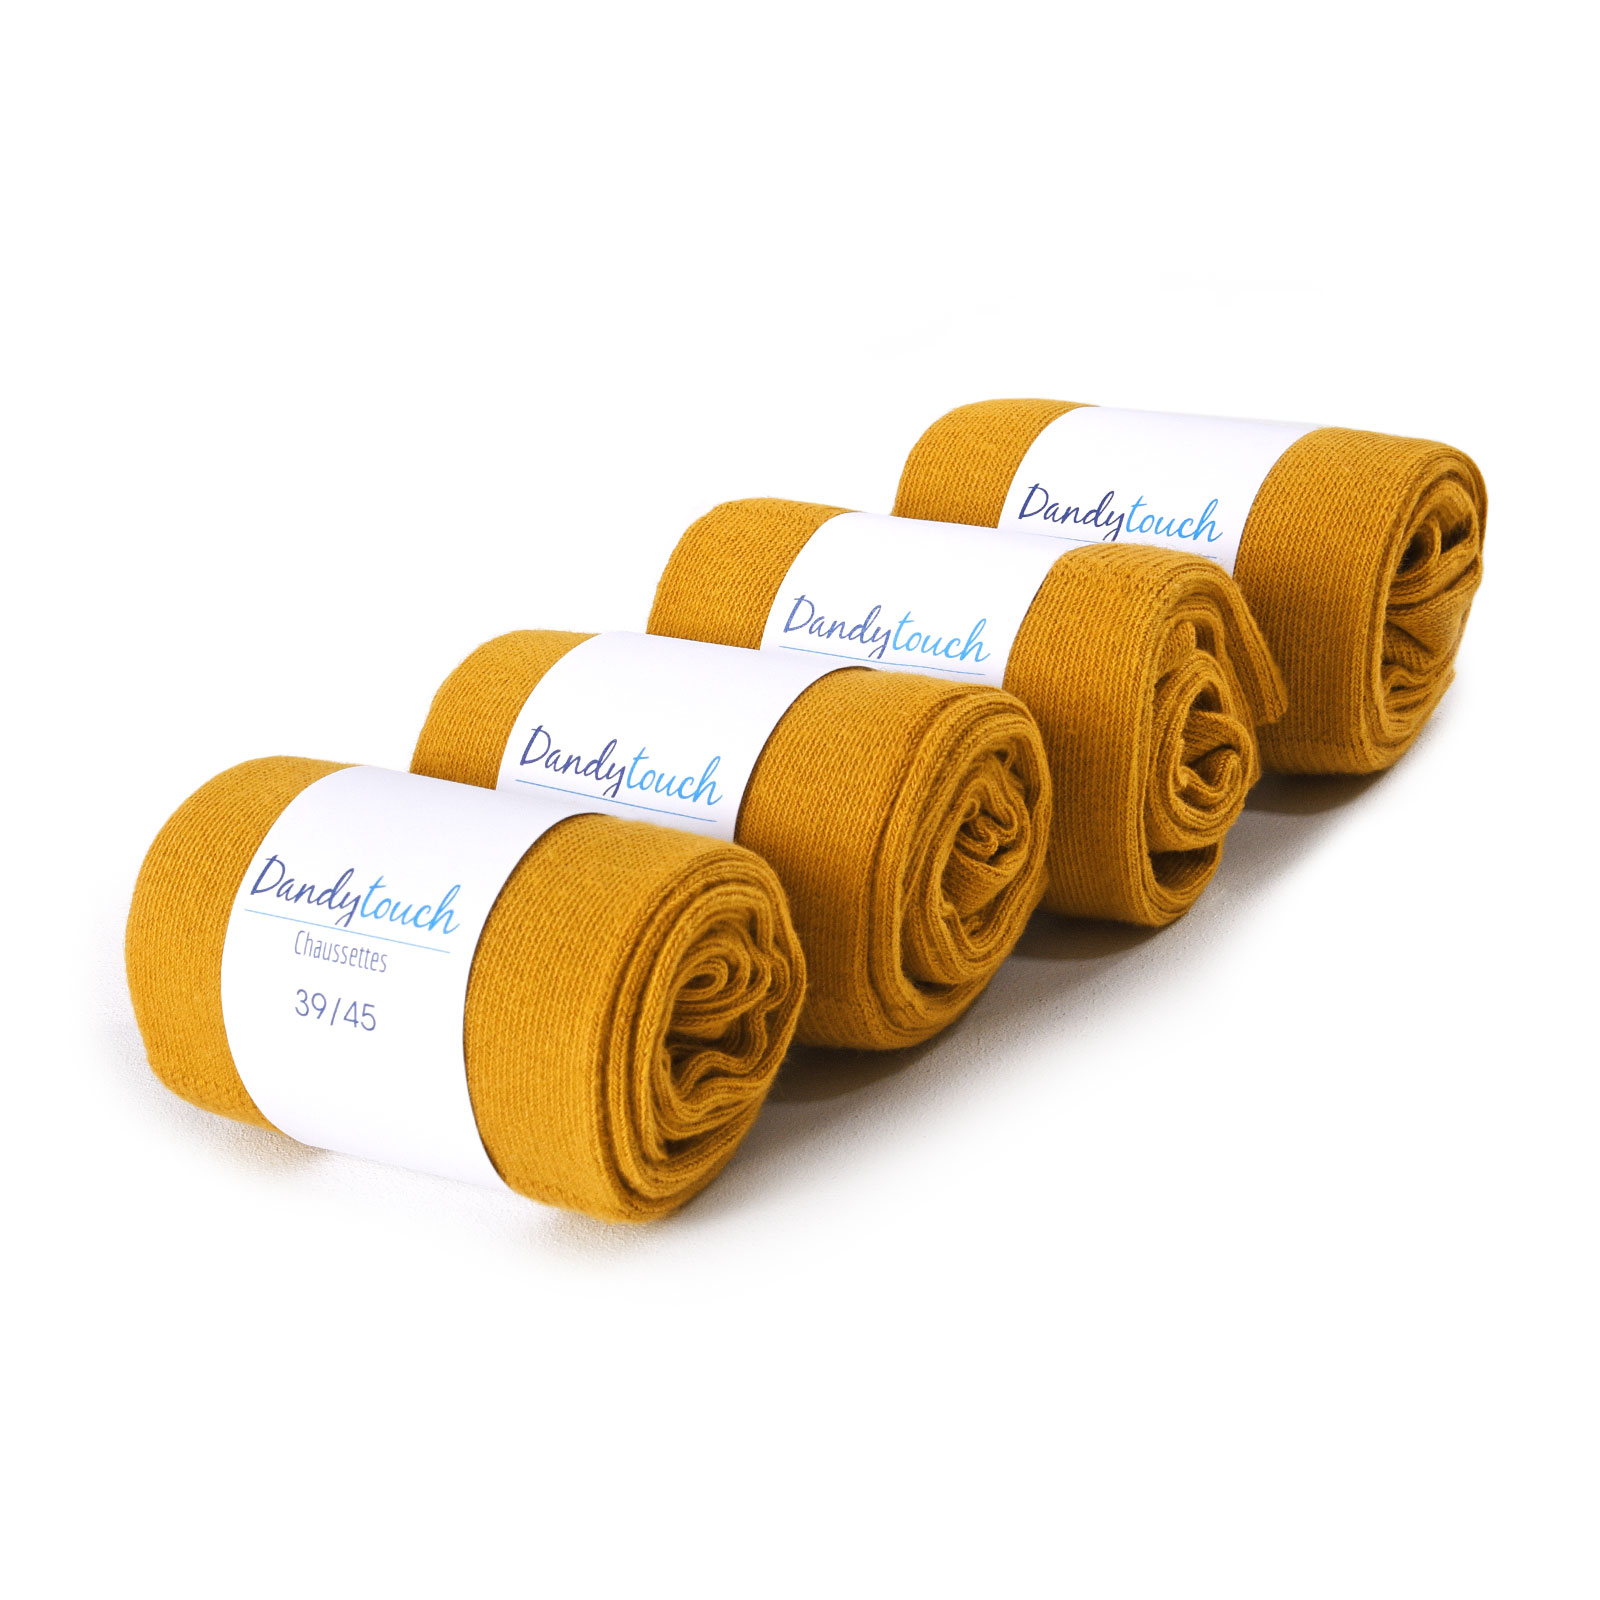 PK-00001-caramel-F16-lot-4-paires-chaussettes-ocre